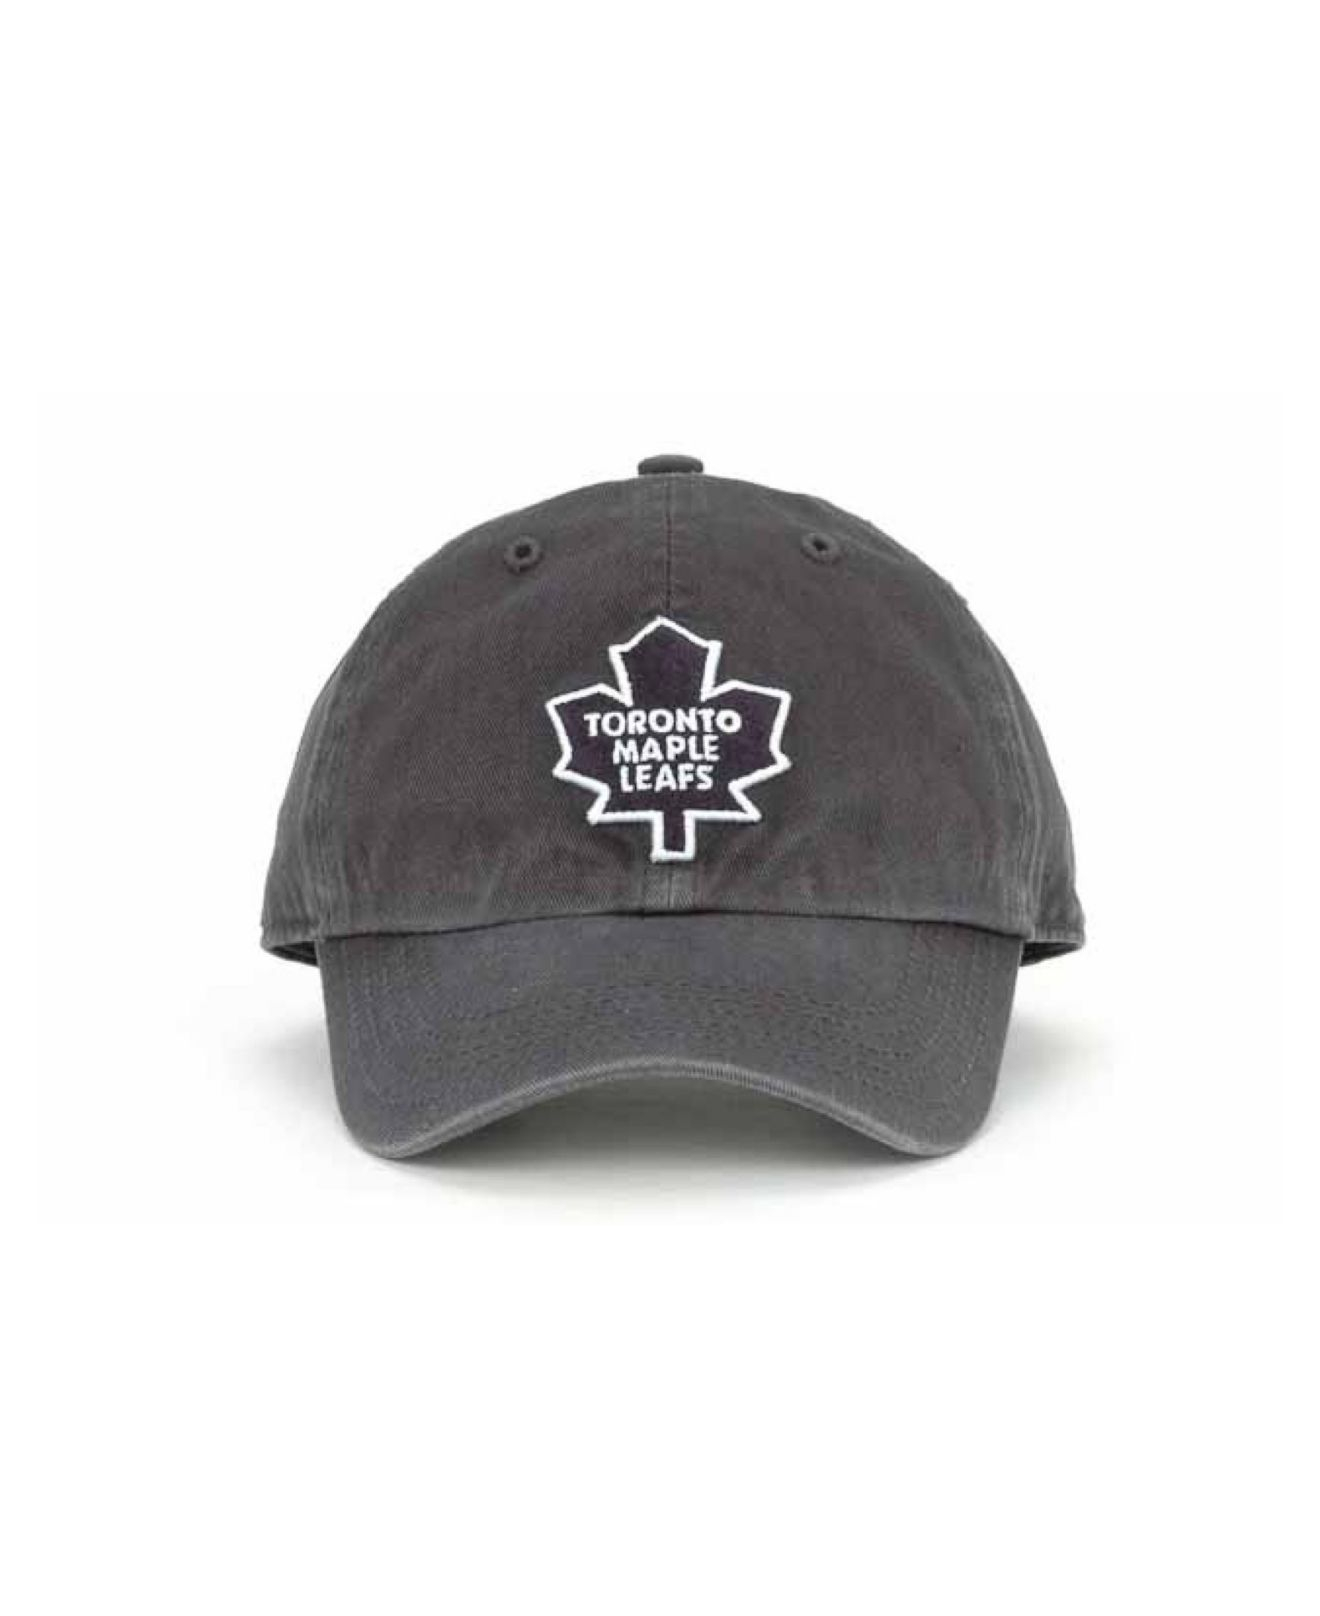 quality design crazy price sale usa online spain toronto maple leafs 47 brand hat 13740 d44ac